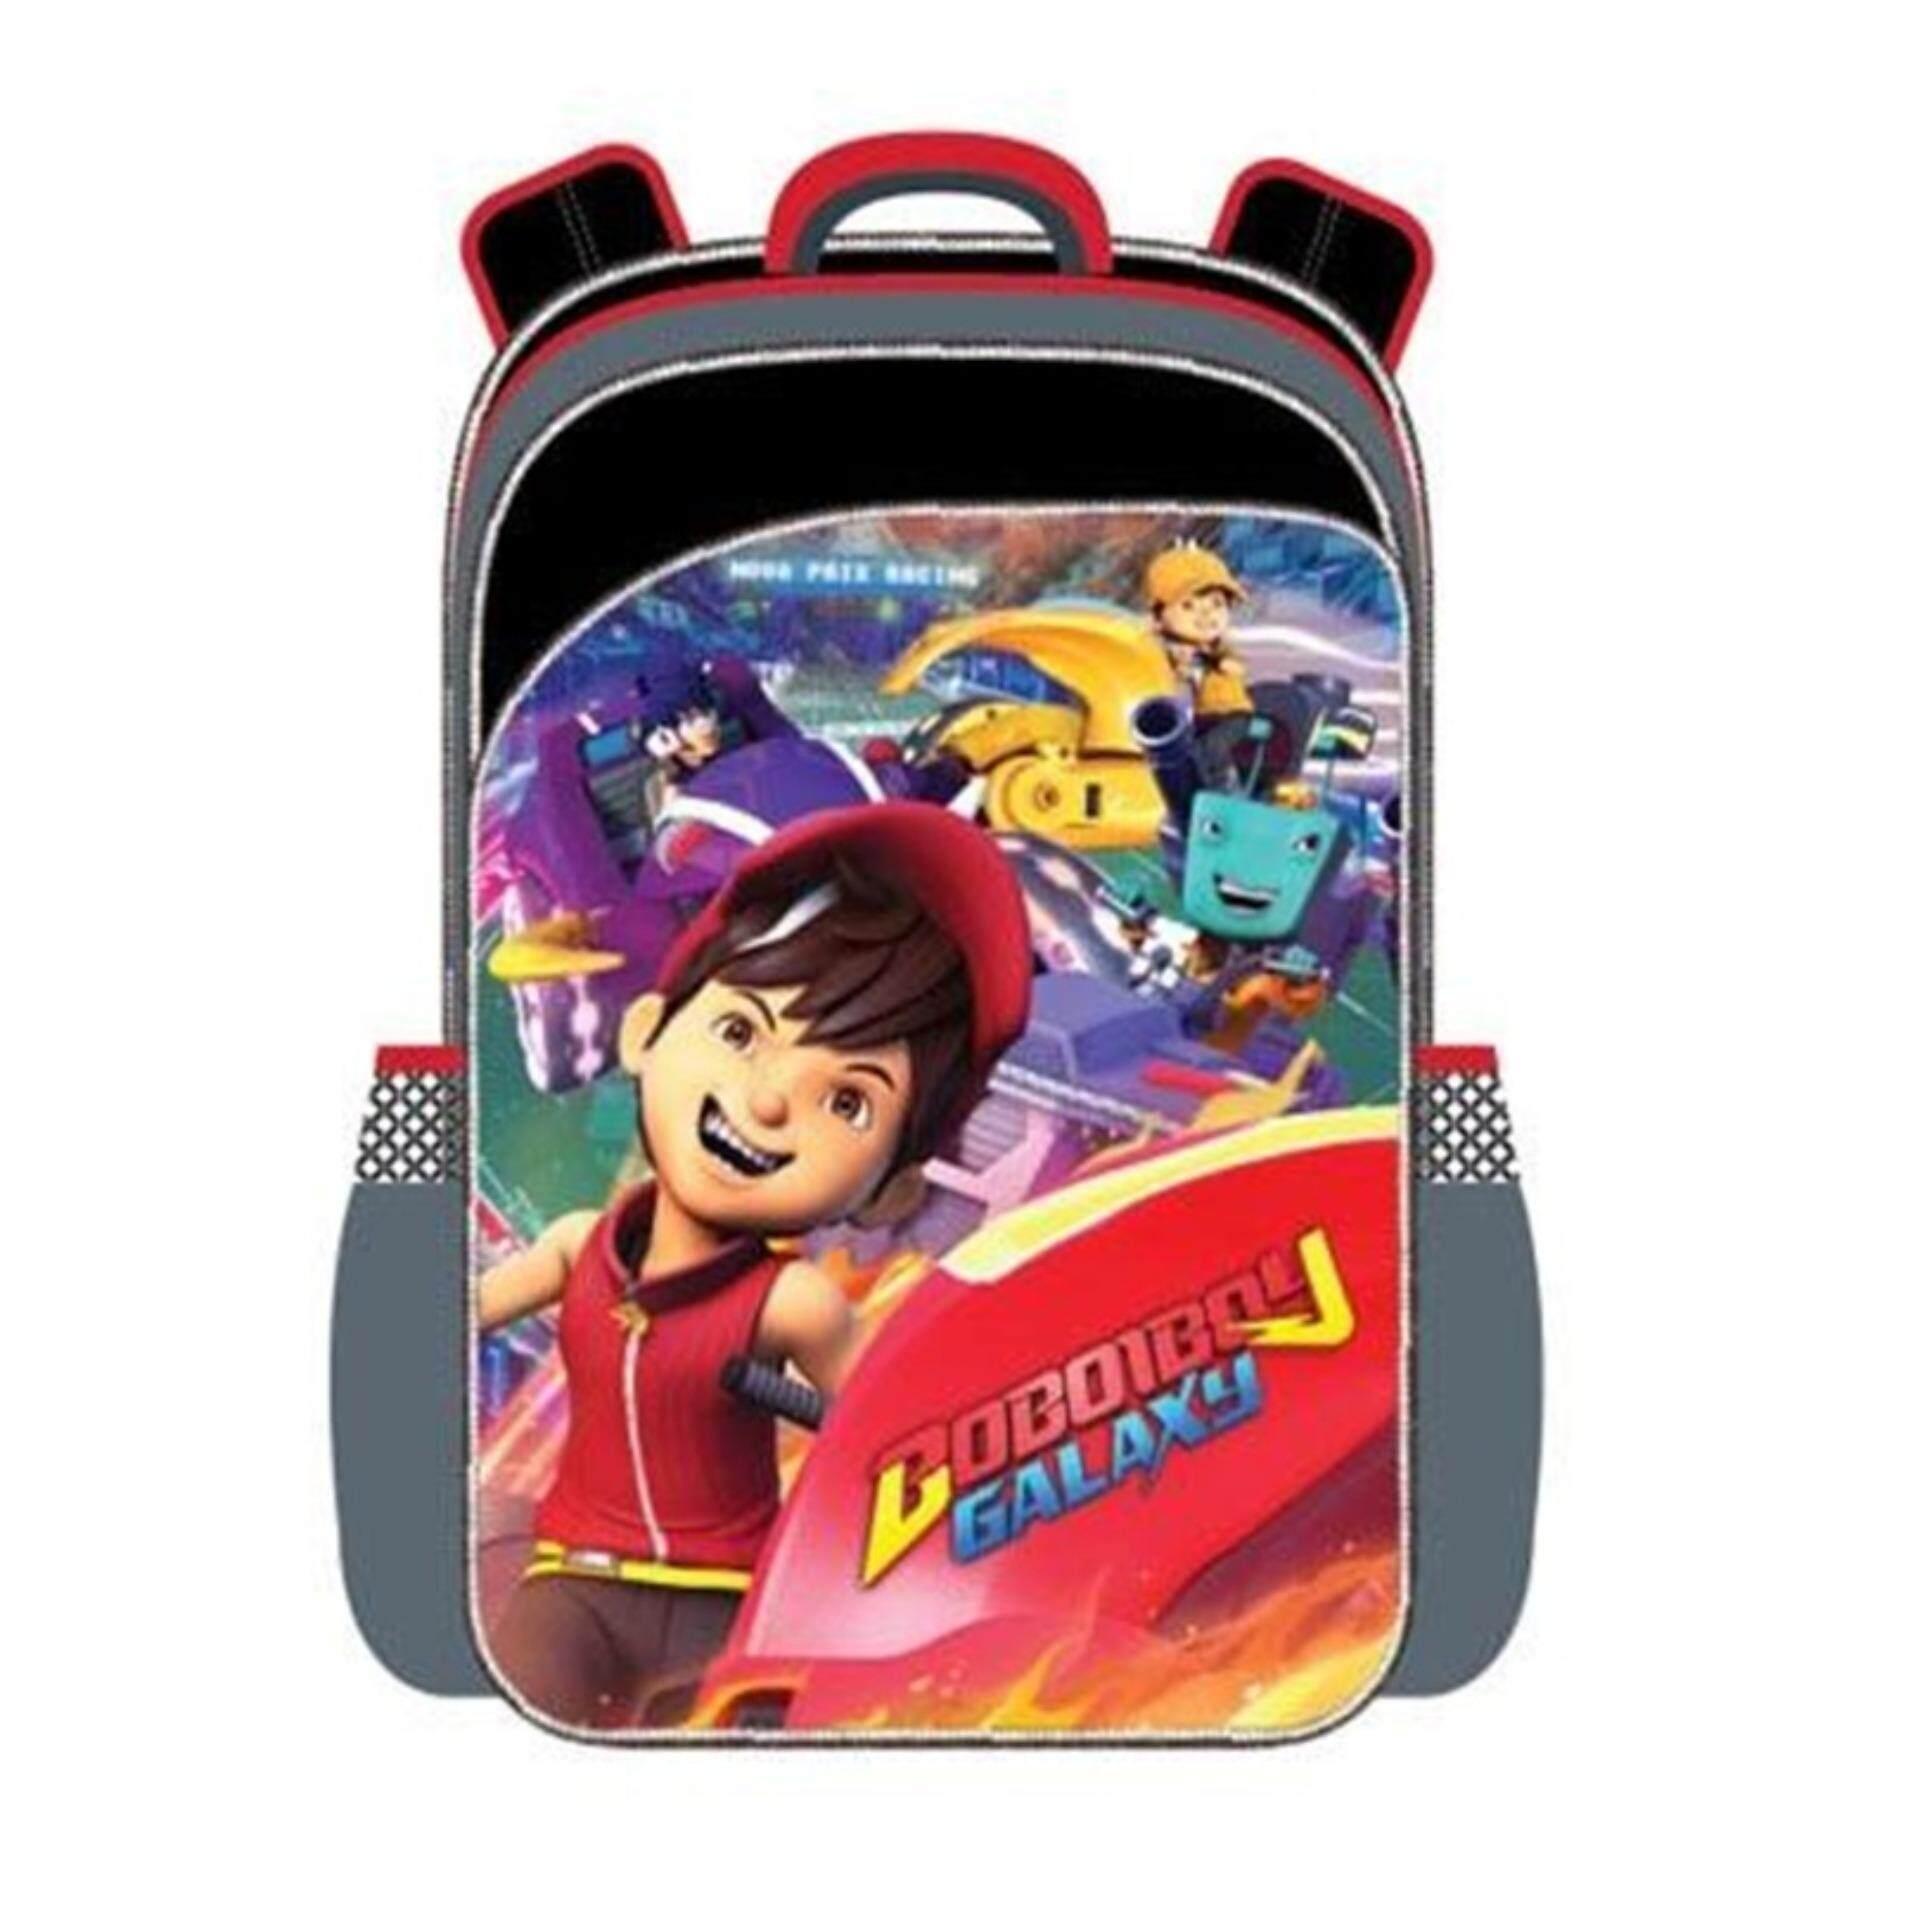 Boboiboy Galaxy Pre School Backpack Kindergarten Nursery Kids Children School Bag - Boboiboy Fire